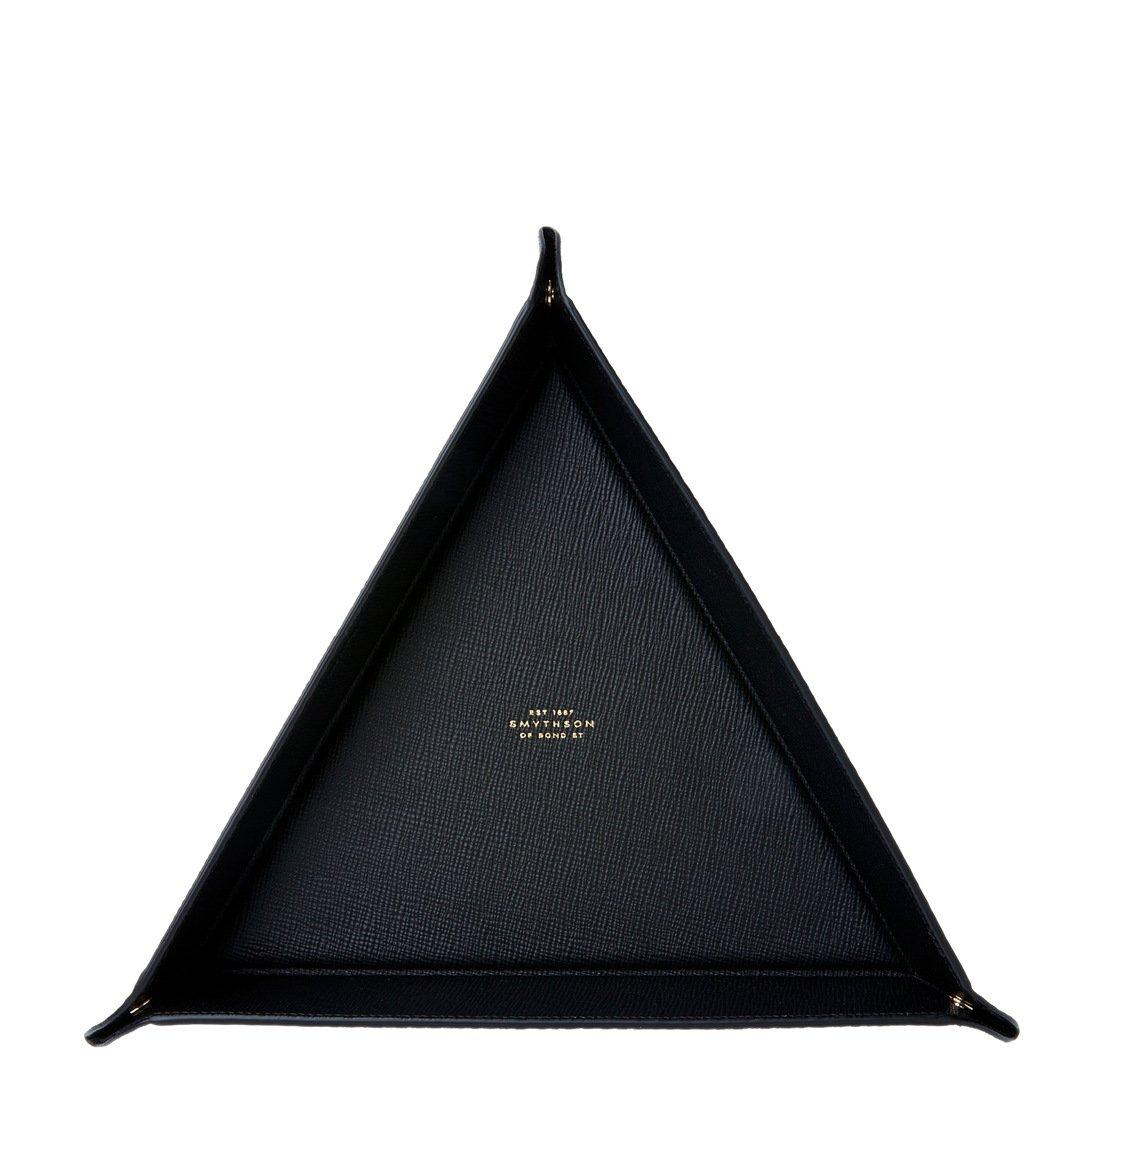 Smythson Panama Triangle Trinket Tray